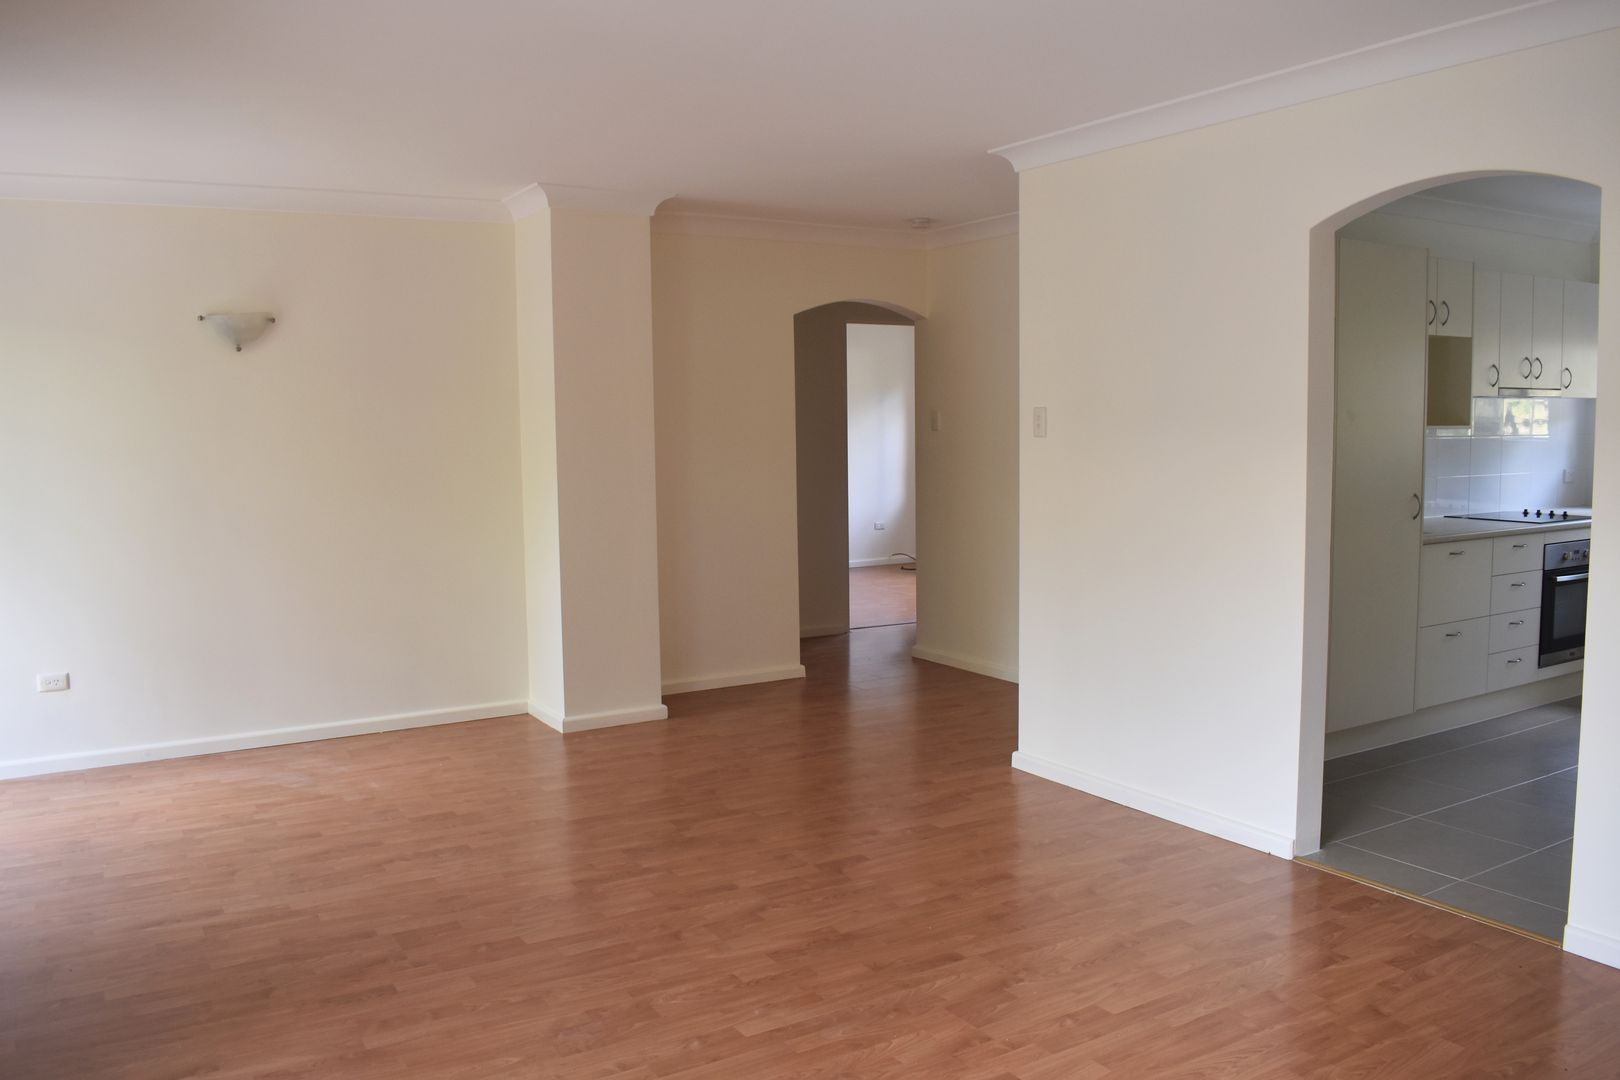 2/124 Whitmore Street, Taringa QLD 4068, Image 2